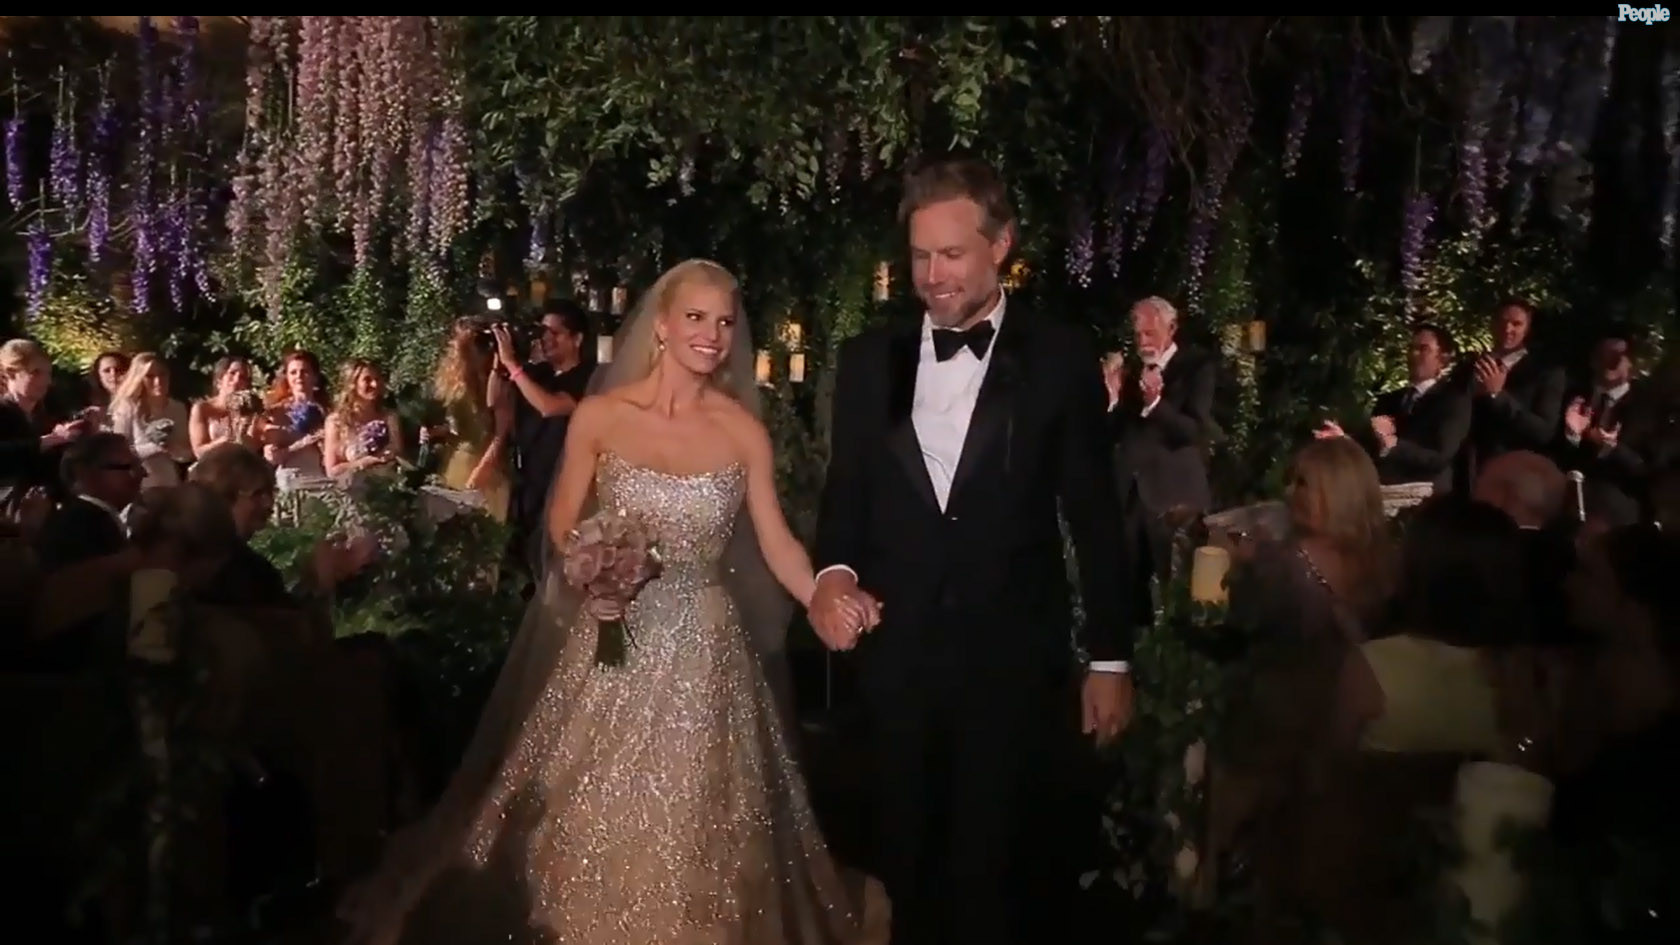 Jessica Simpsons wedding video shows off elegant fun affair  LA Times